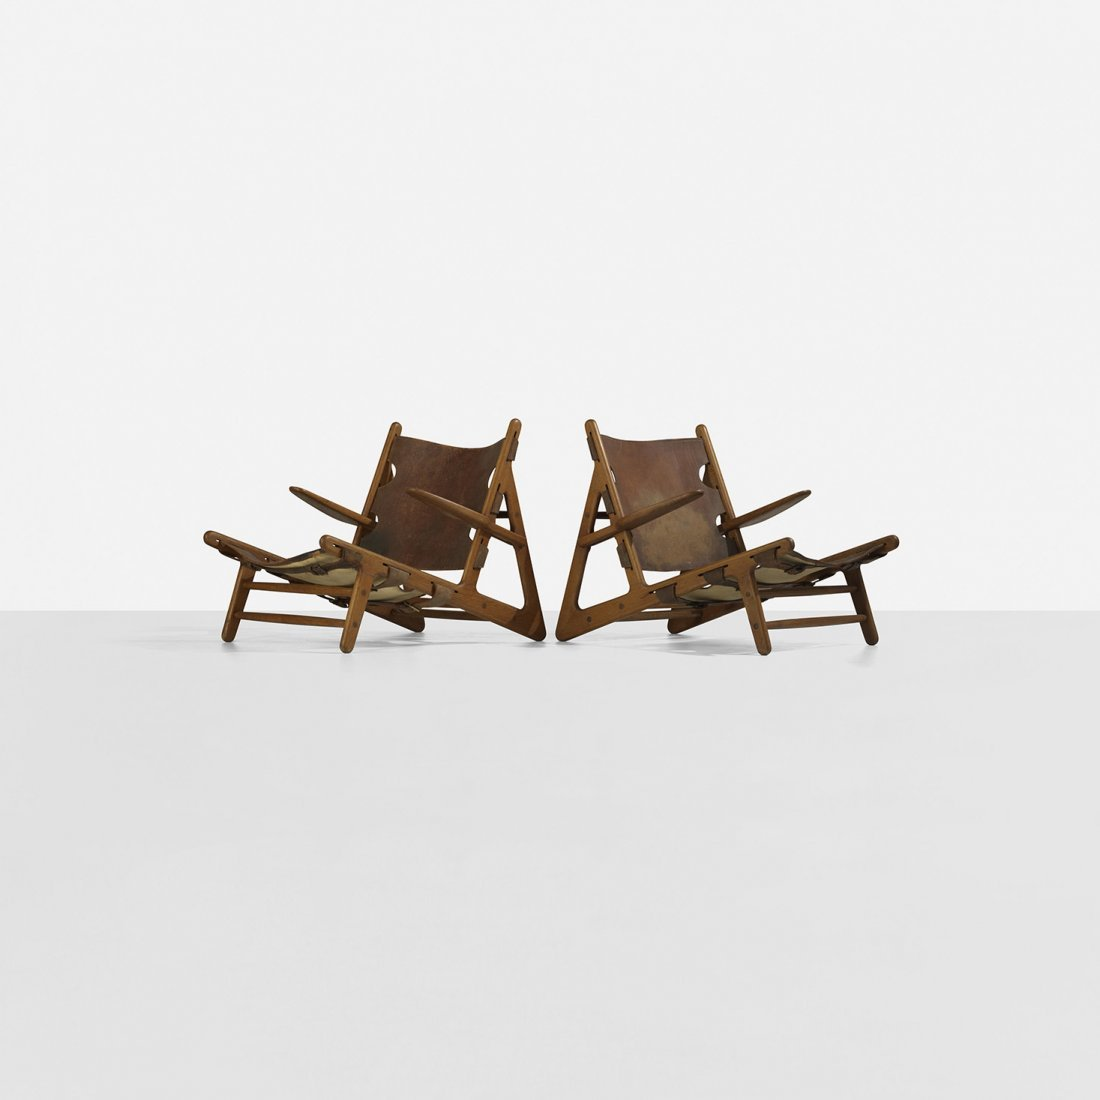 108: Børge Mogensen Hunting chairs, pair